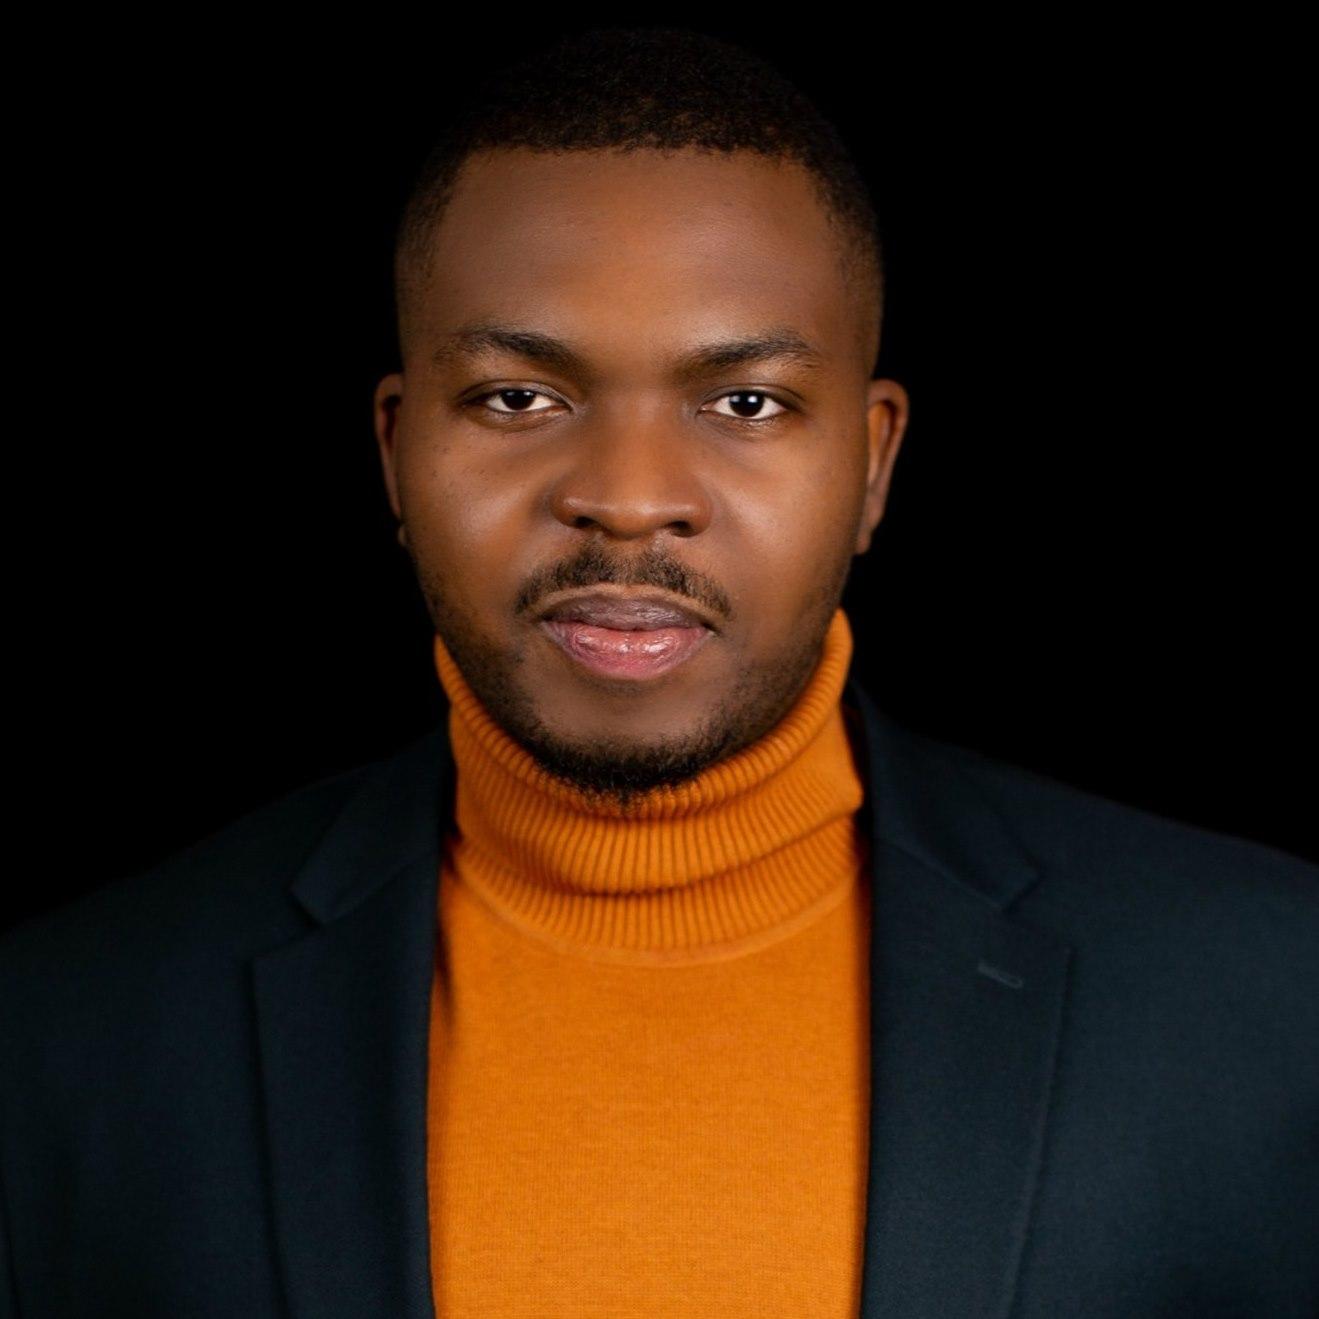 Emmanuel Adoh